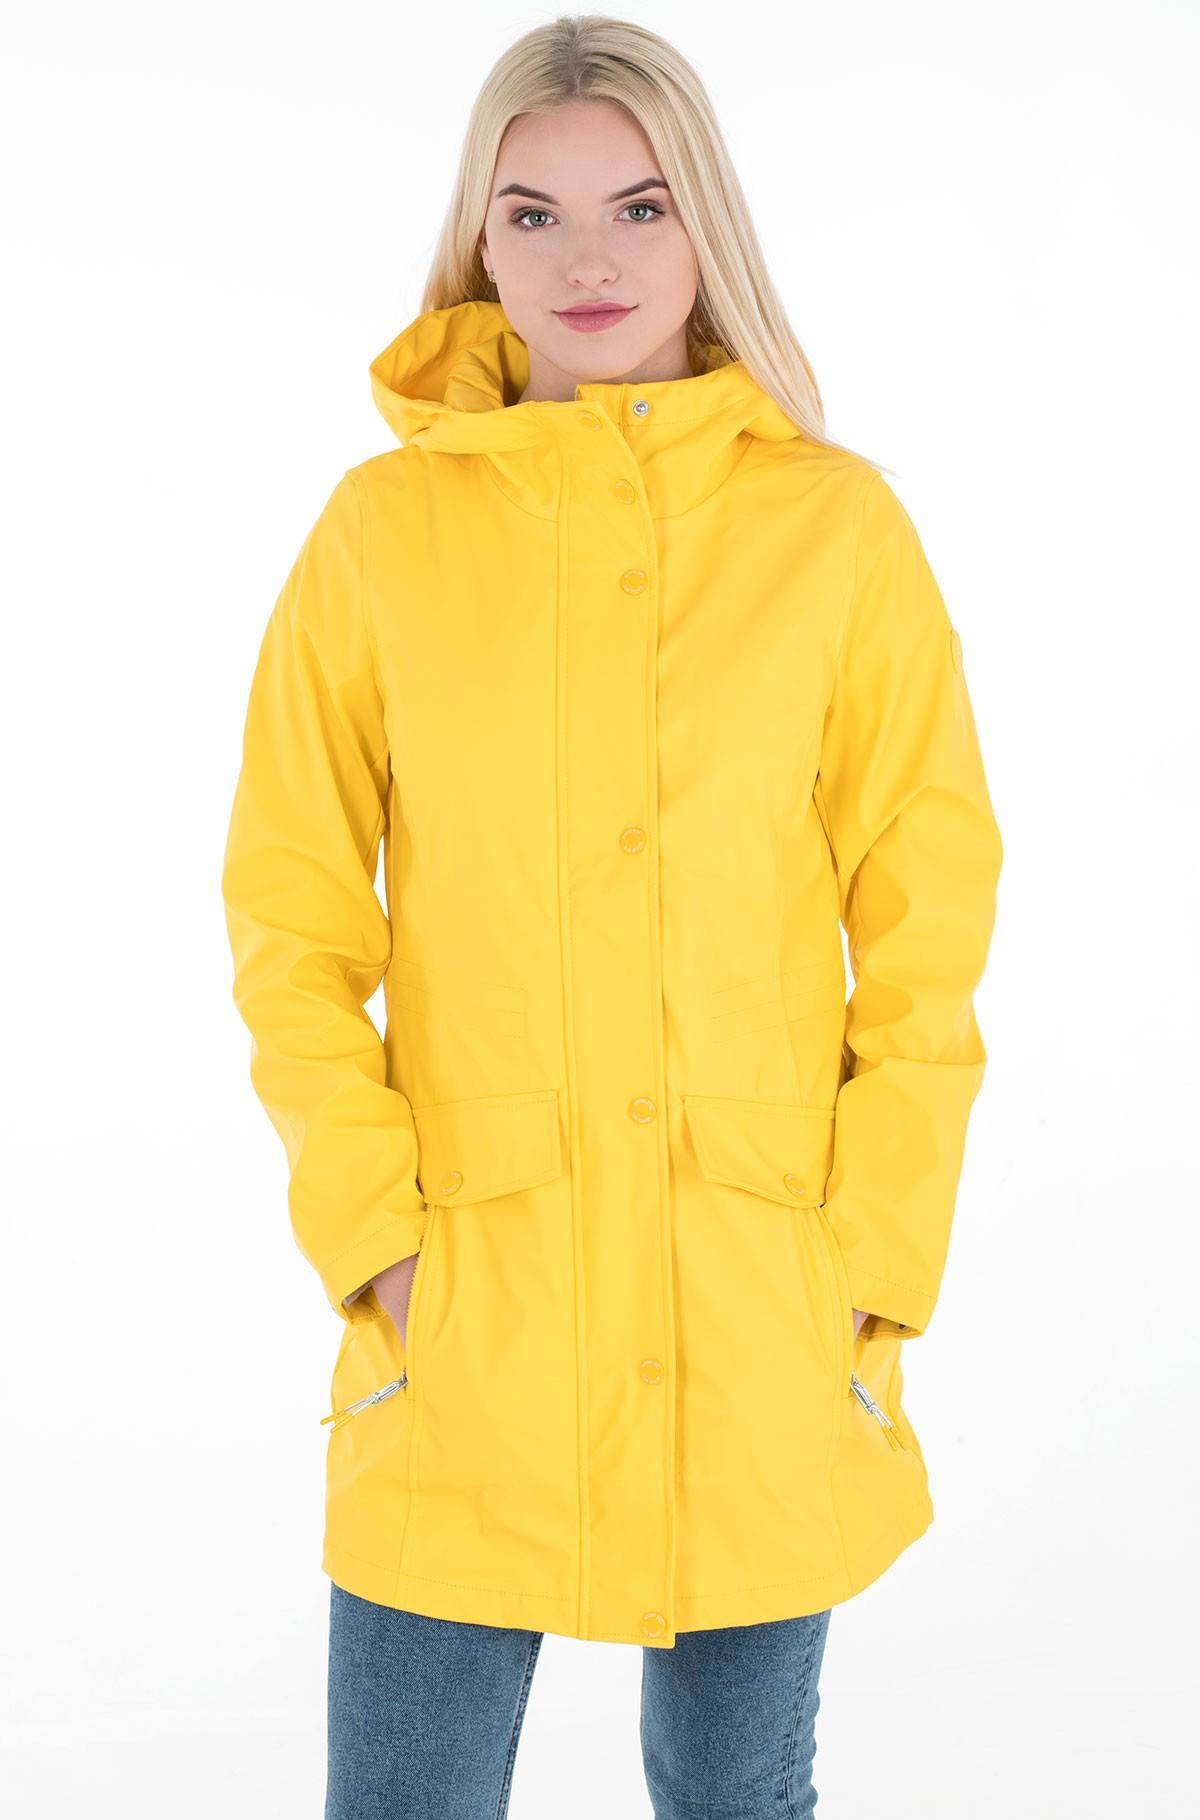 Rain jacket 1024461-full-2